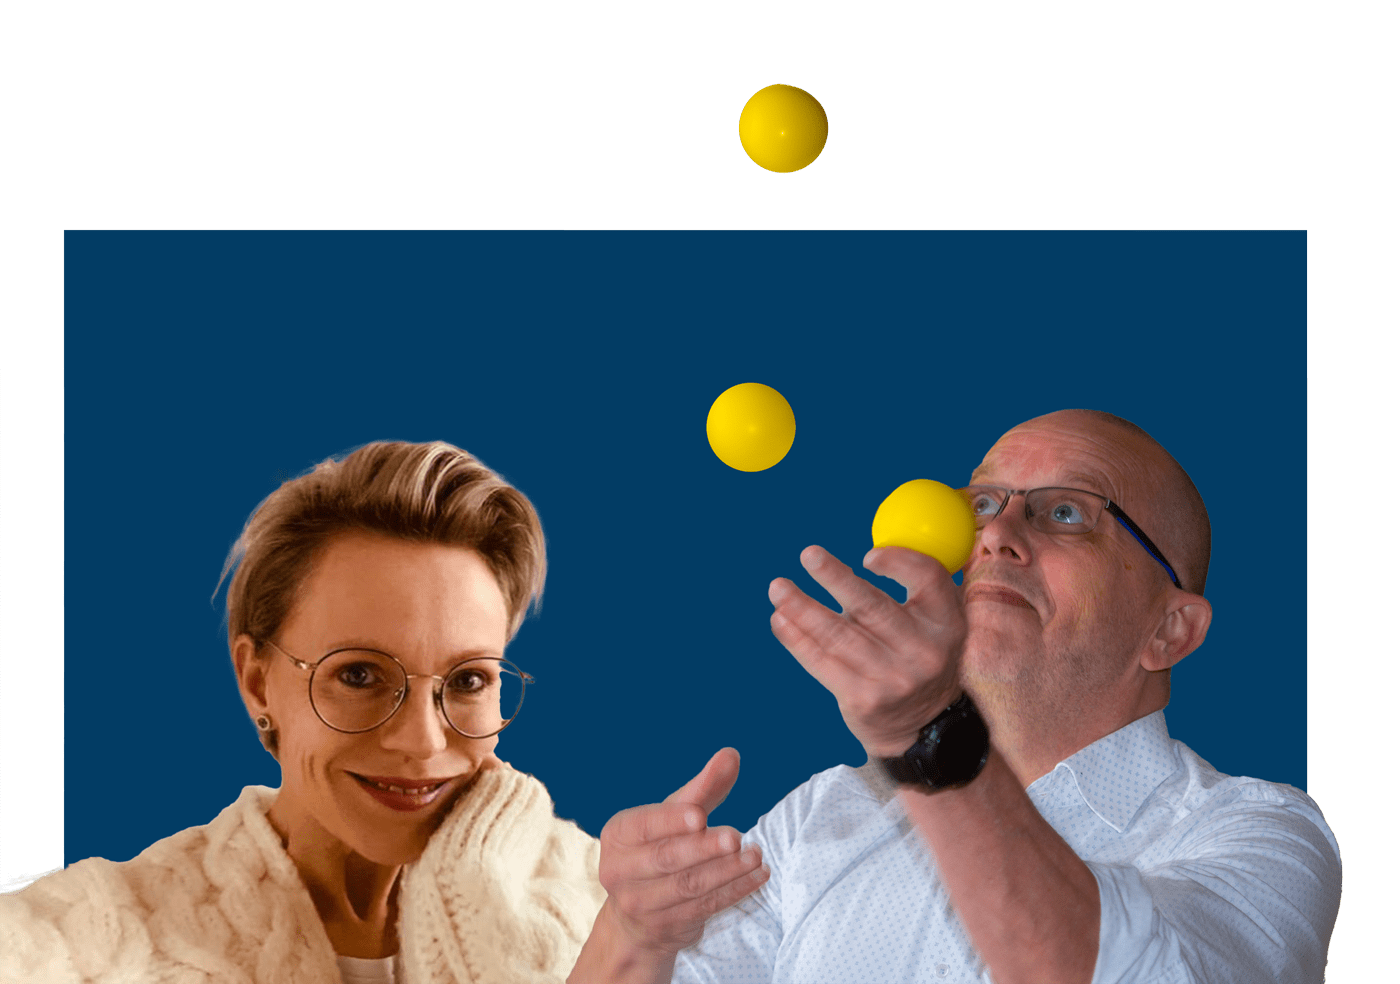 Samen-in-portret